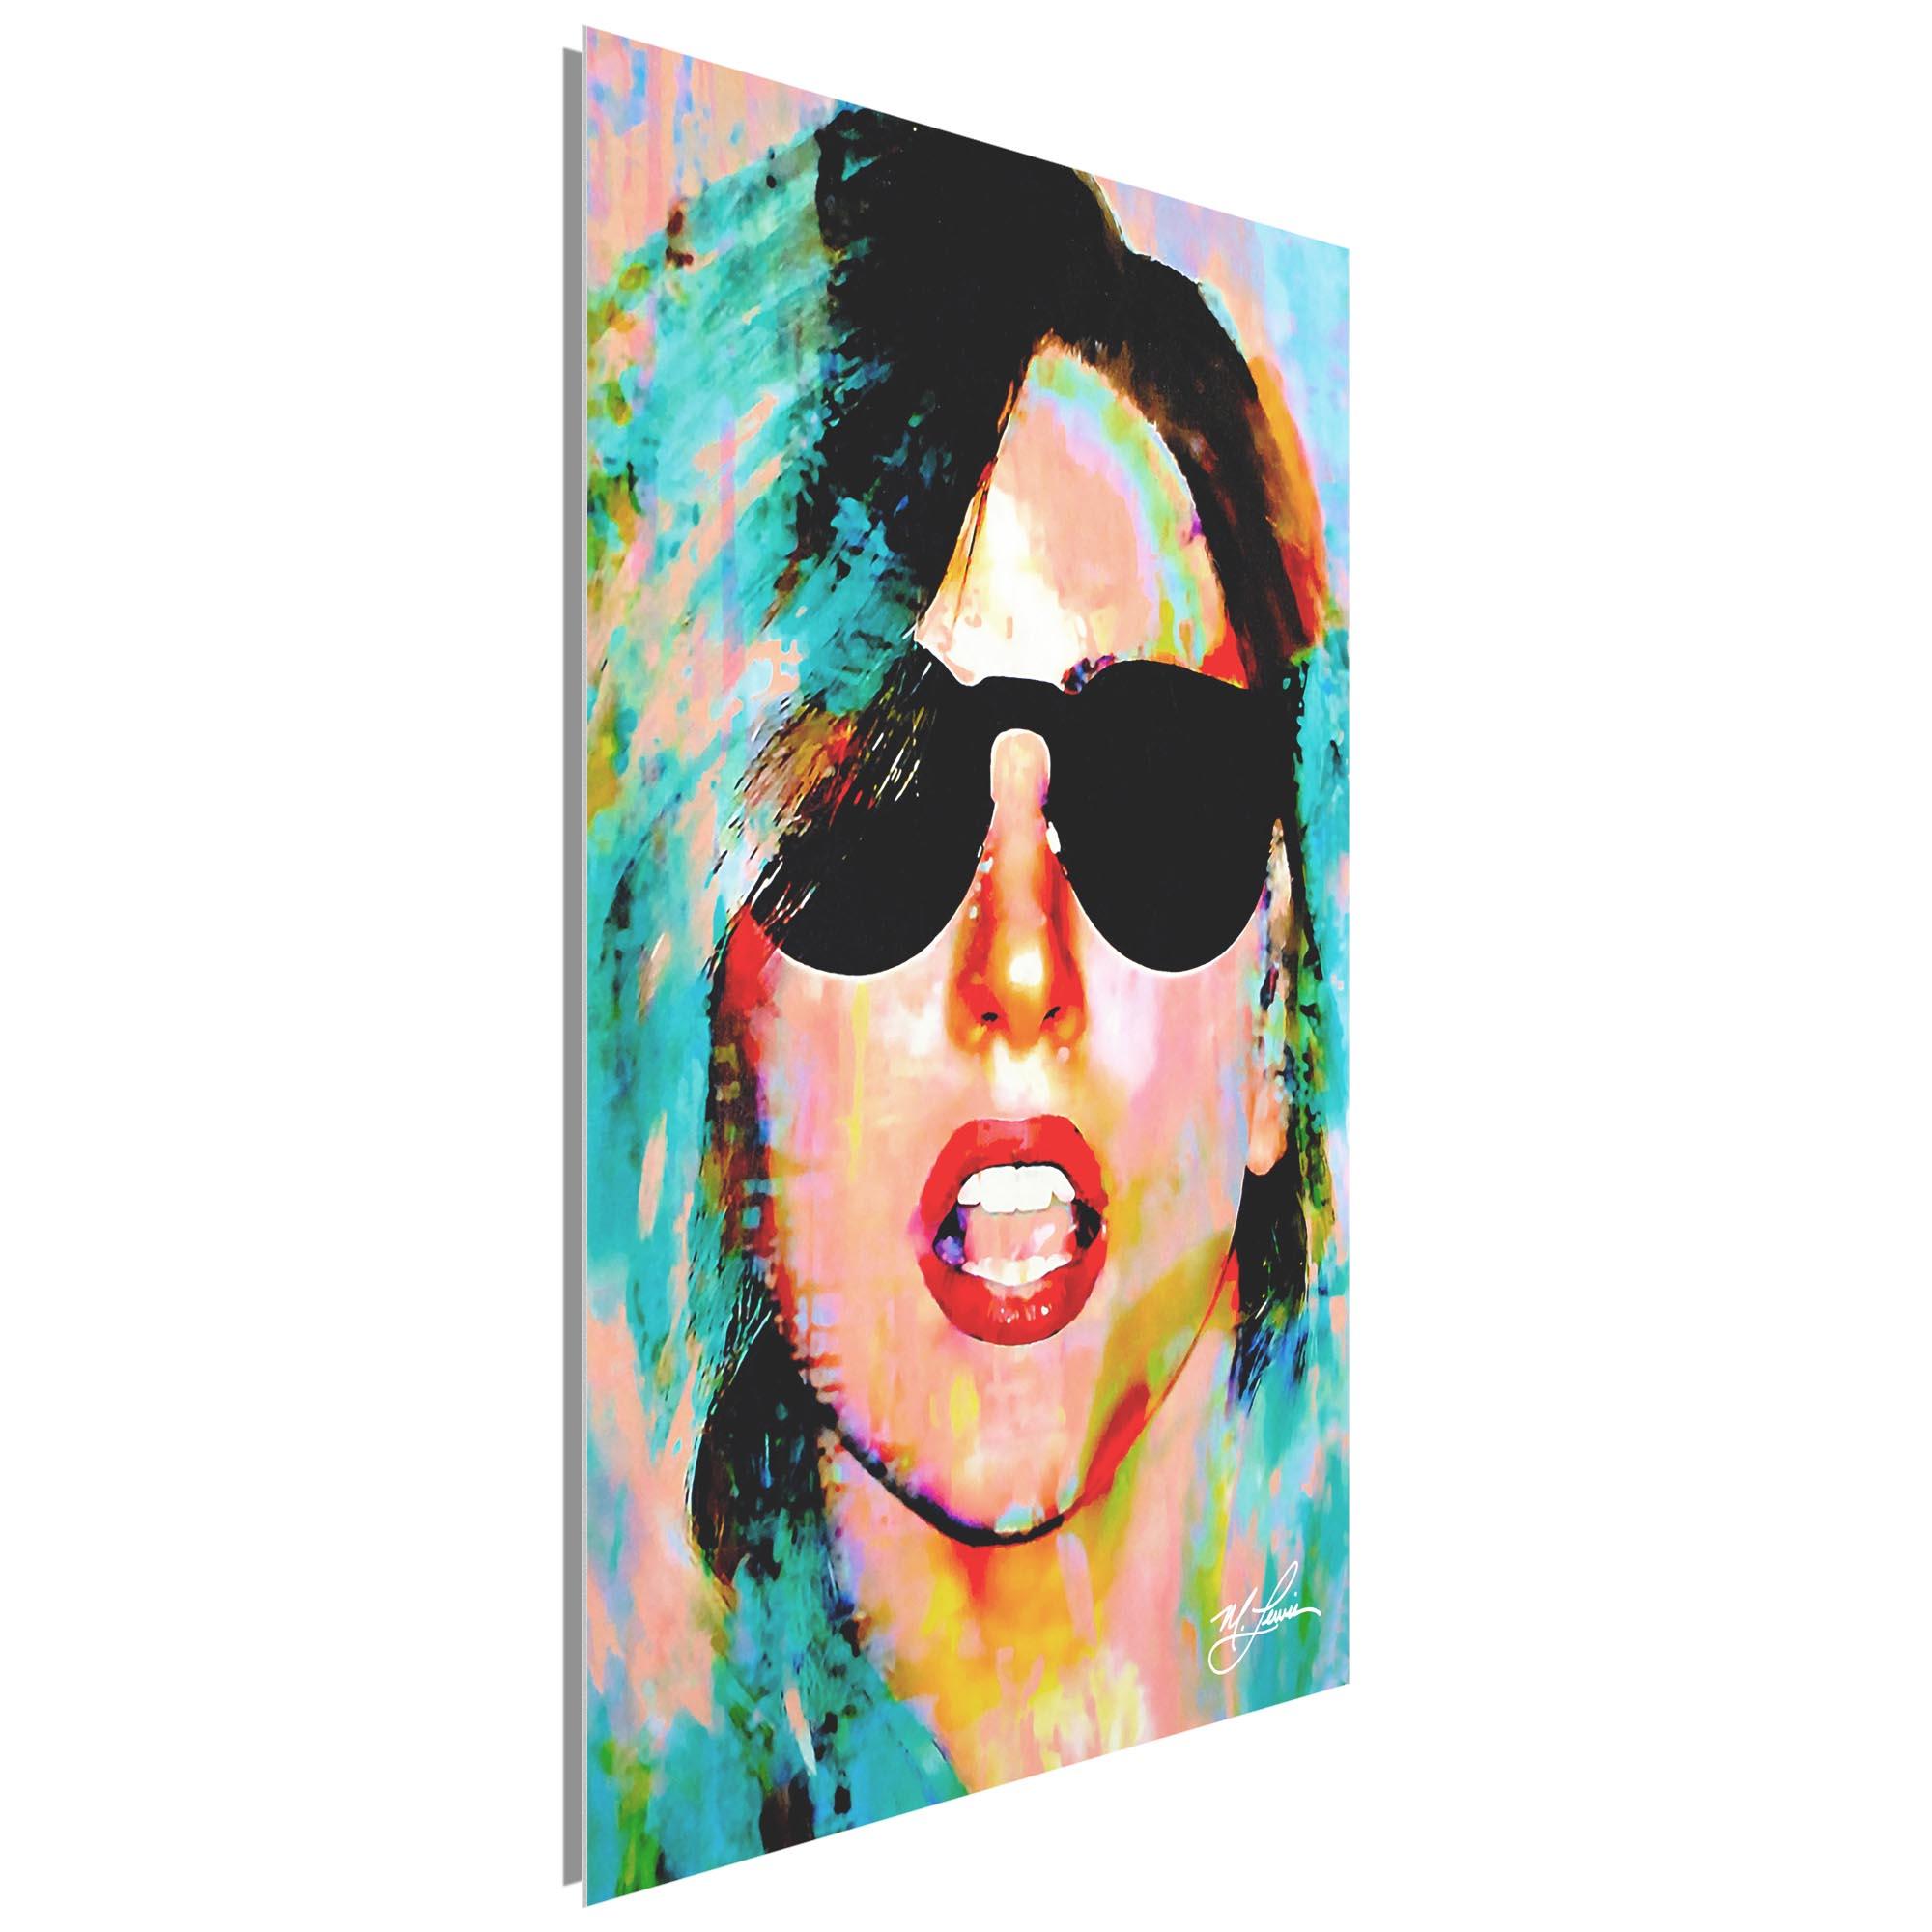 Lady Gaga Everyday Art by Mark Lewis - Contemporary Pop Art on Metal or Plexiglass - Image 2